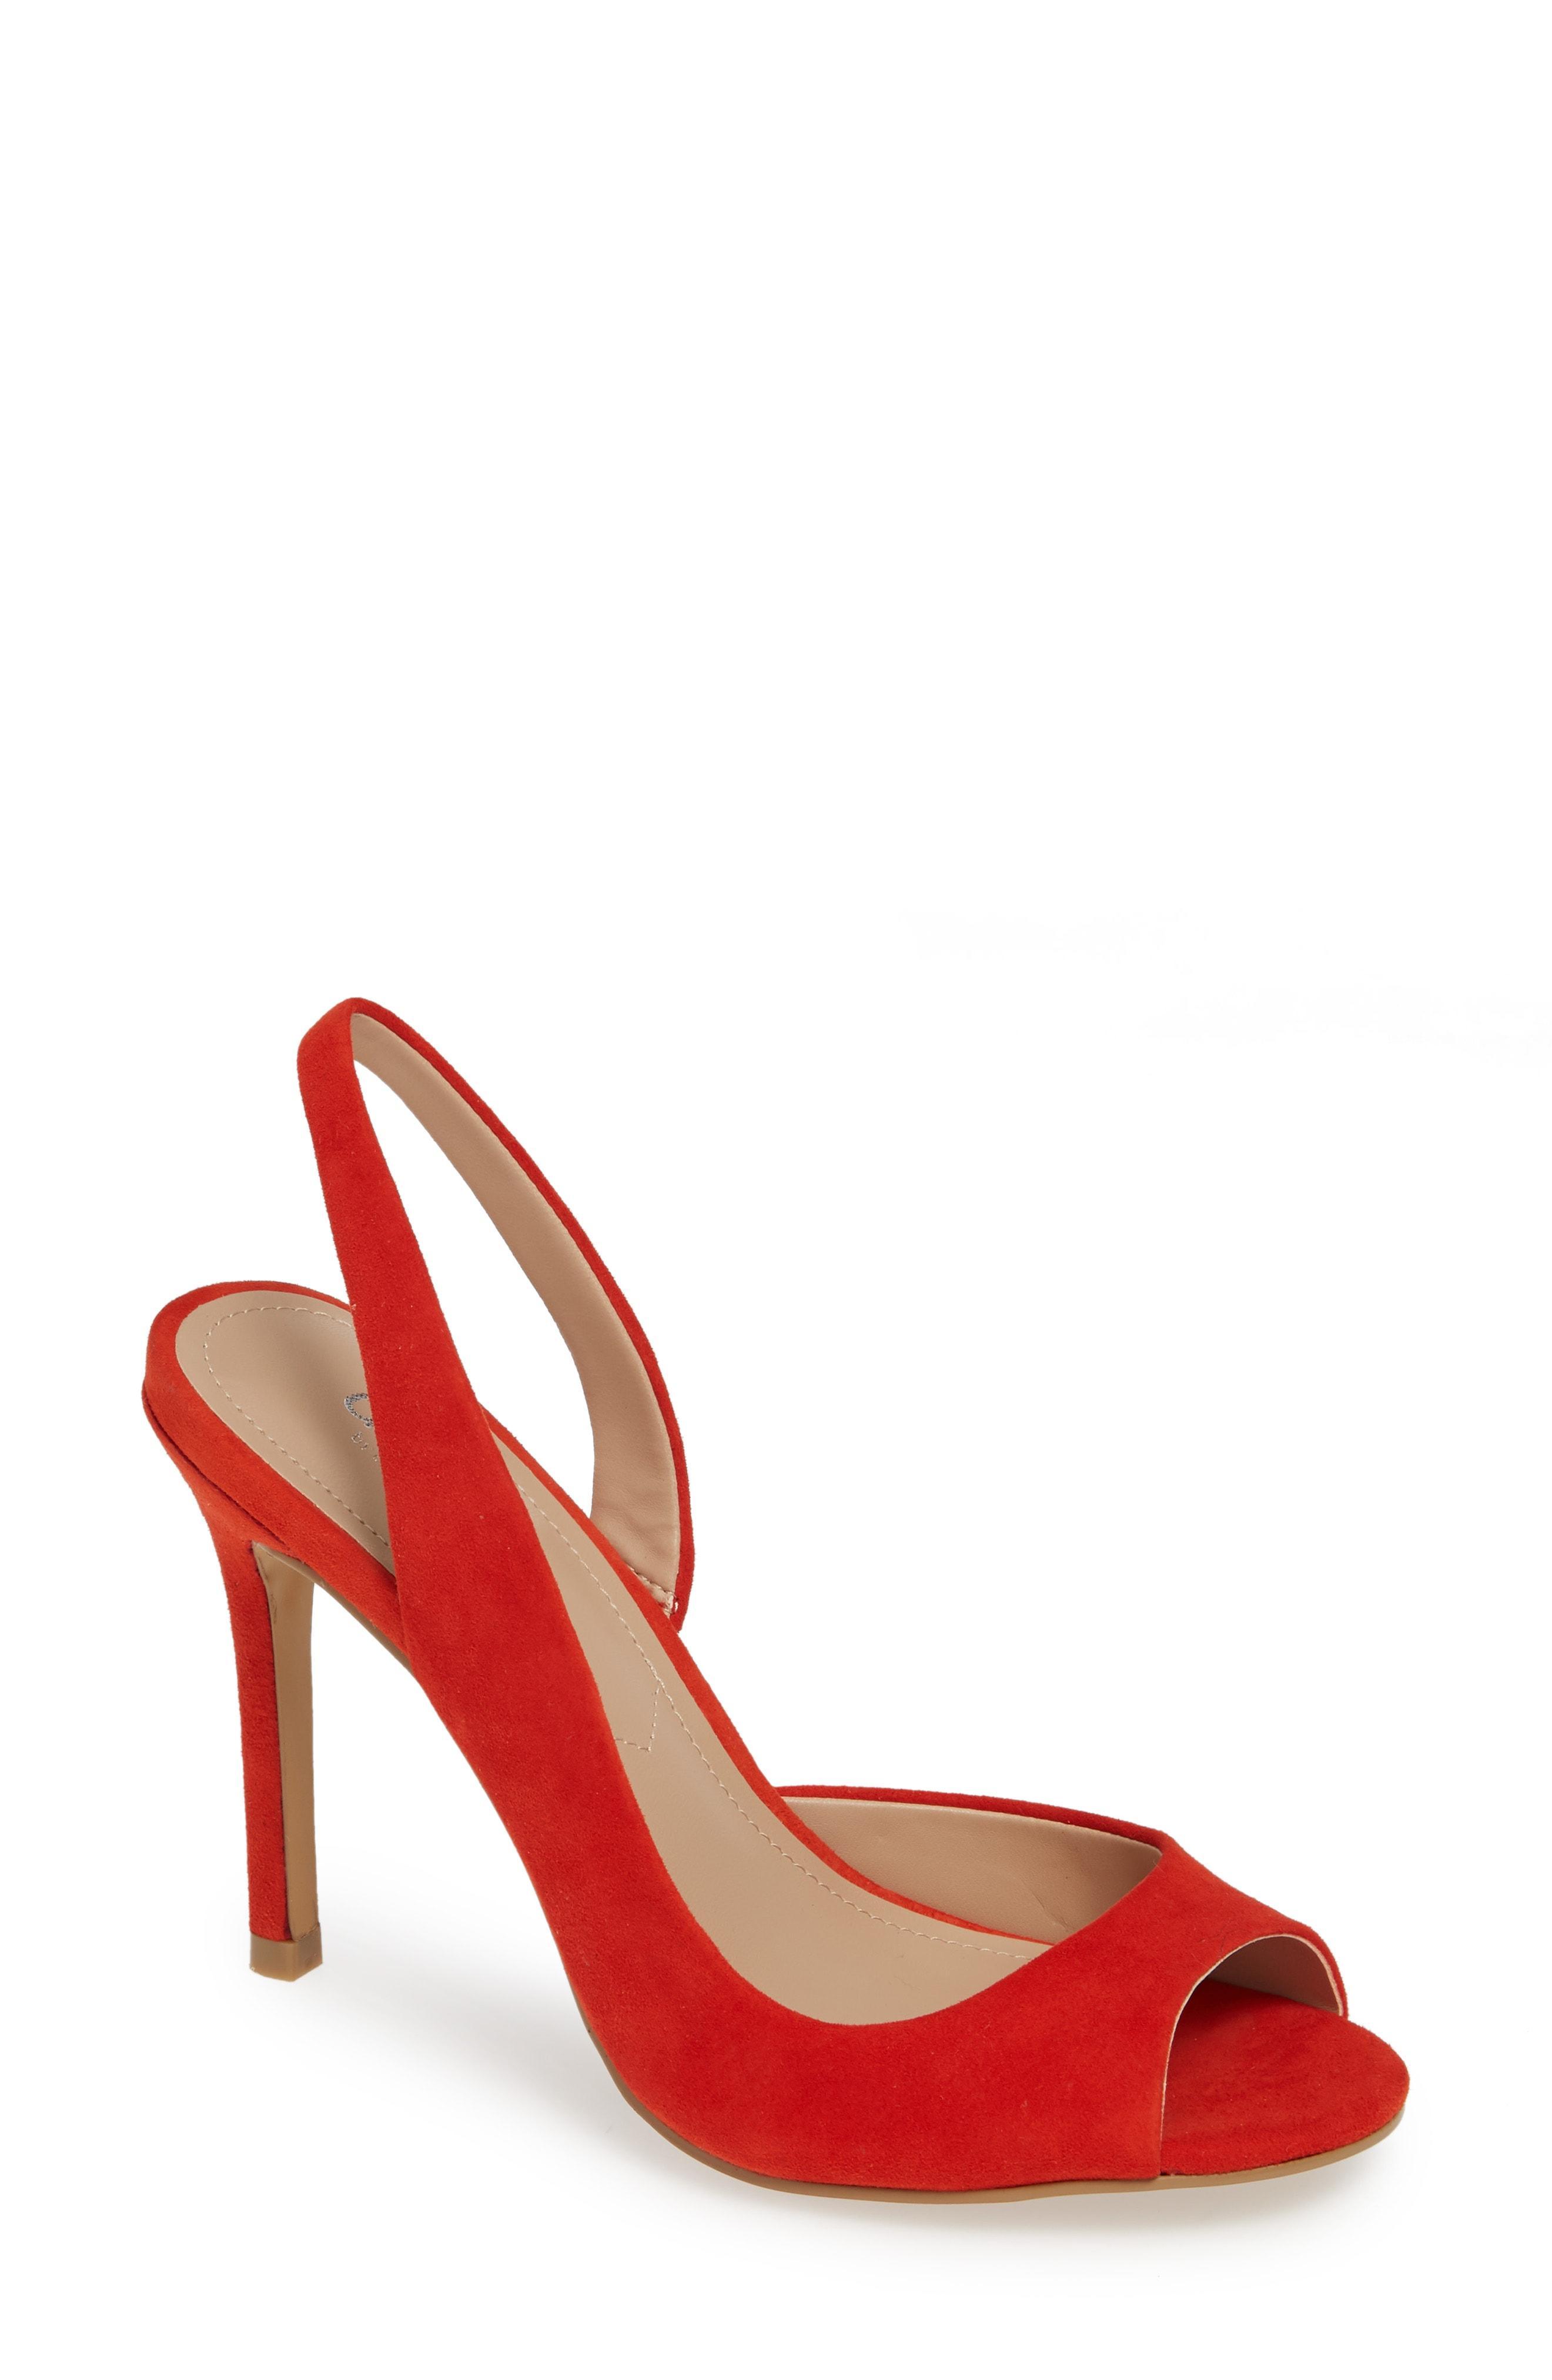 31f30a05ffd Lyst - Charles David Rexx Sandal in Red